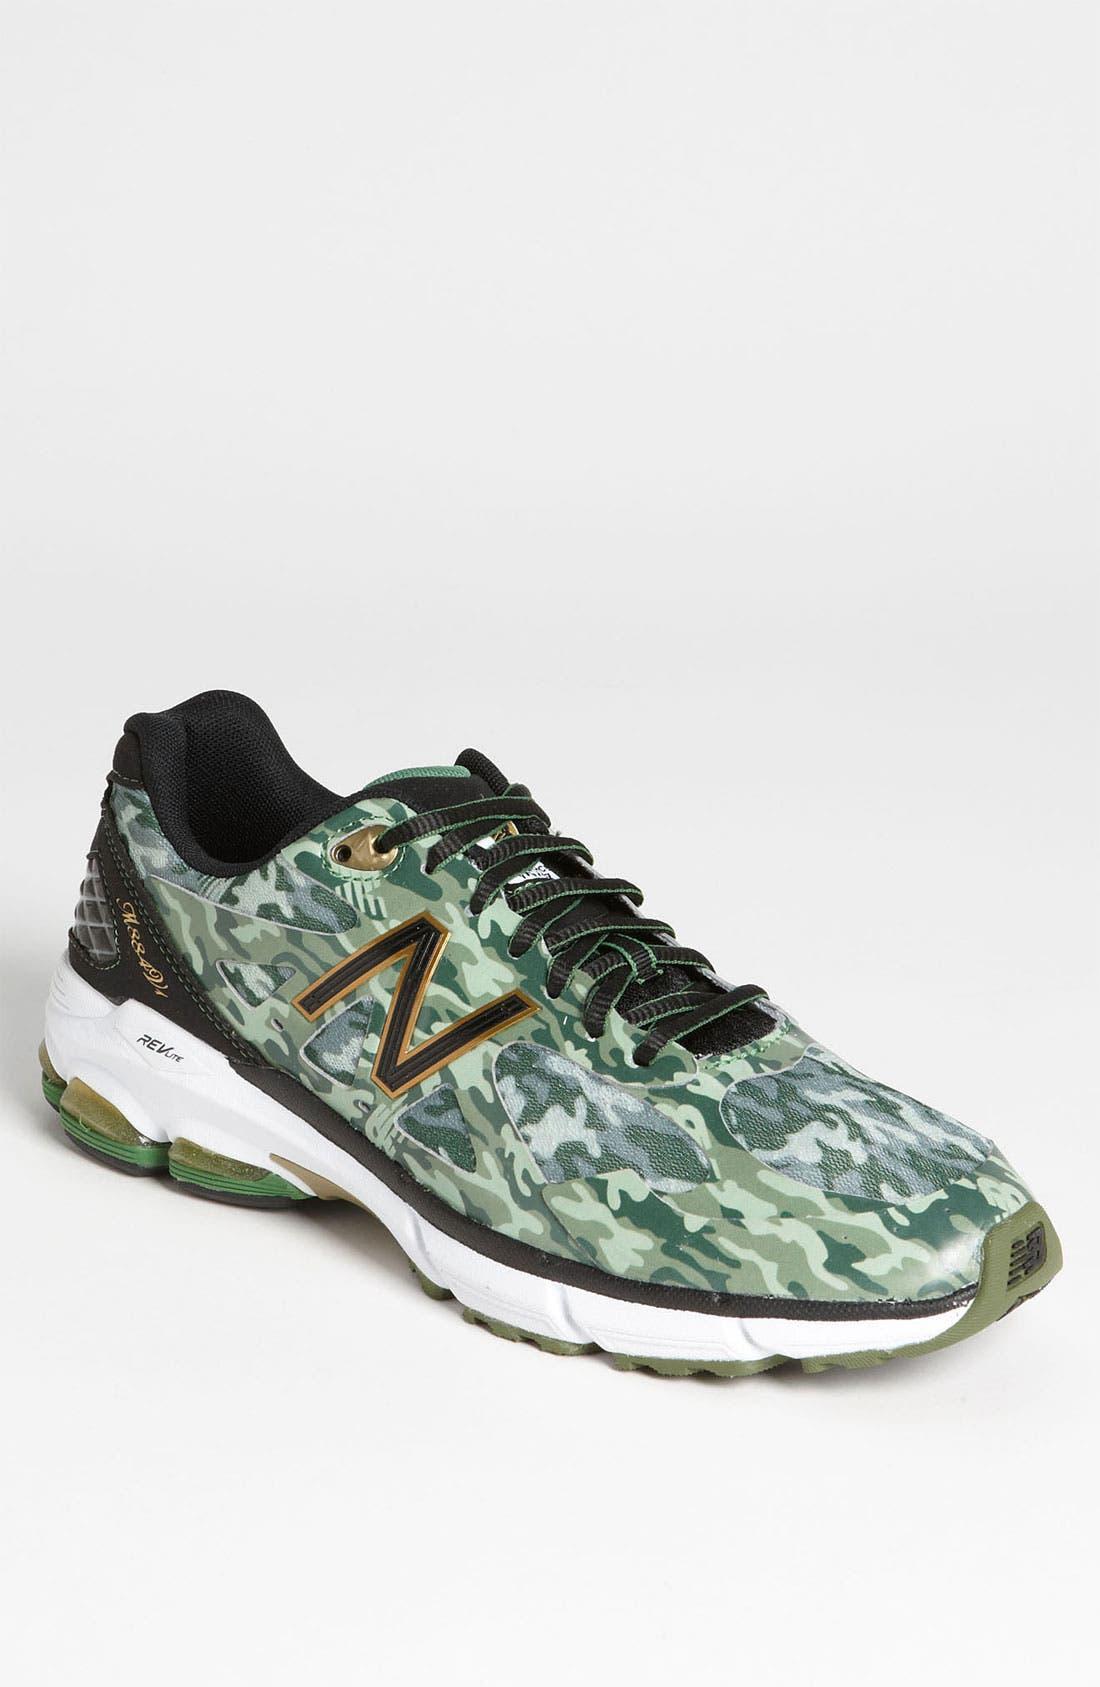 Alternate Image 1 Selected - New Balance '884' Running Shoe (Men)